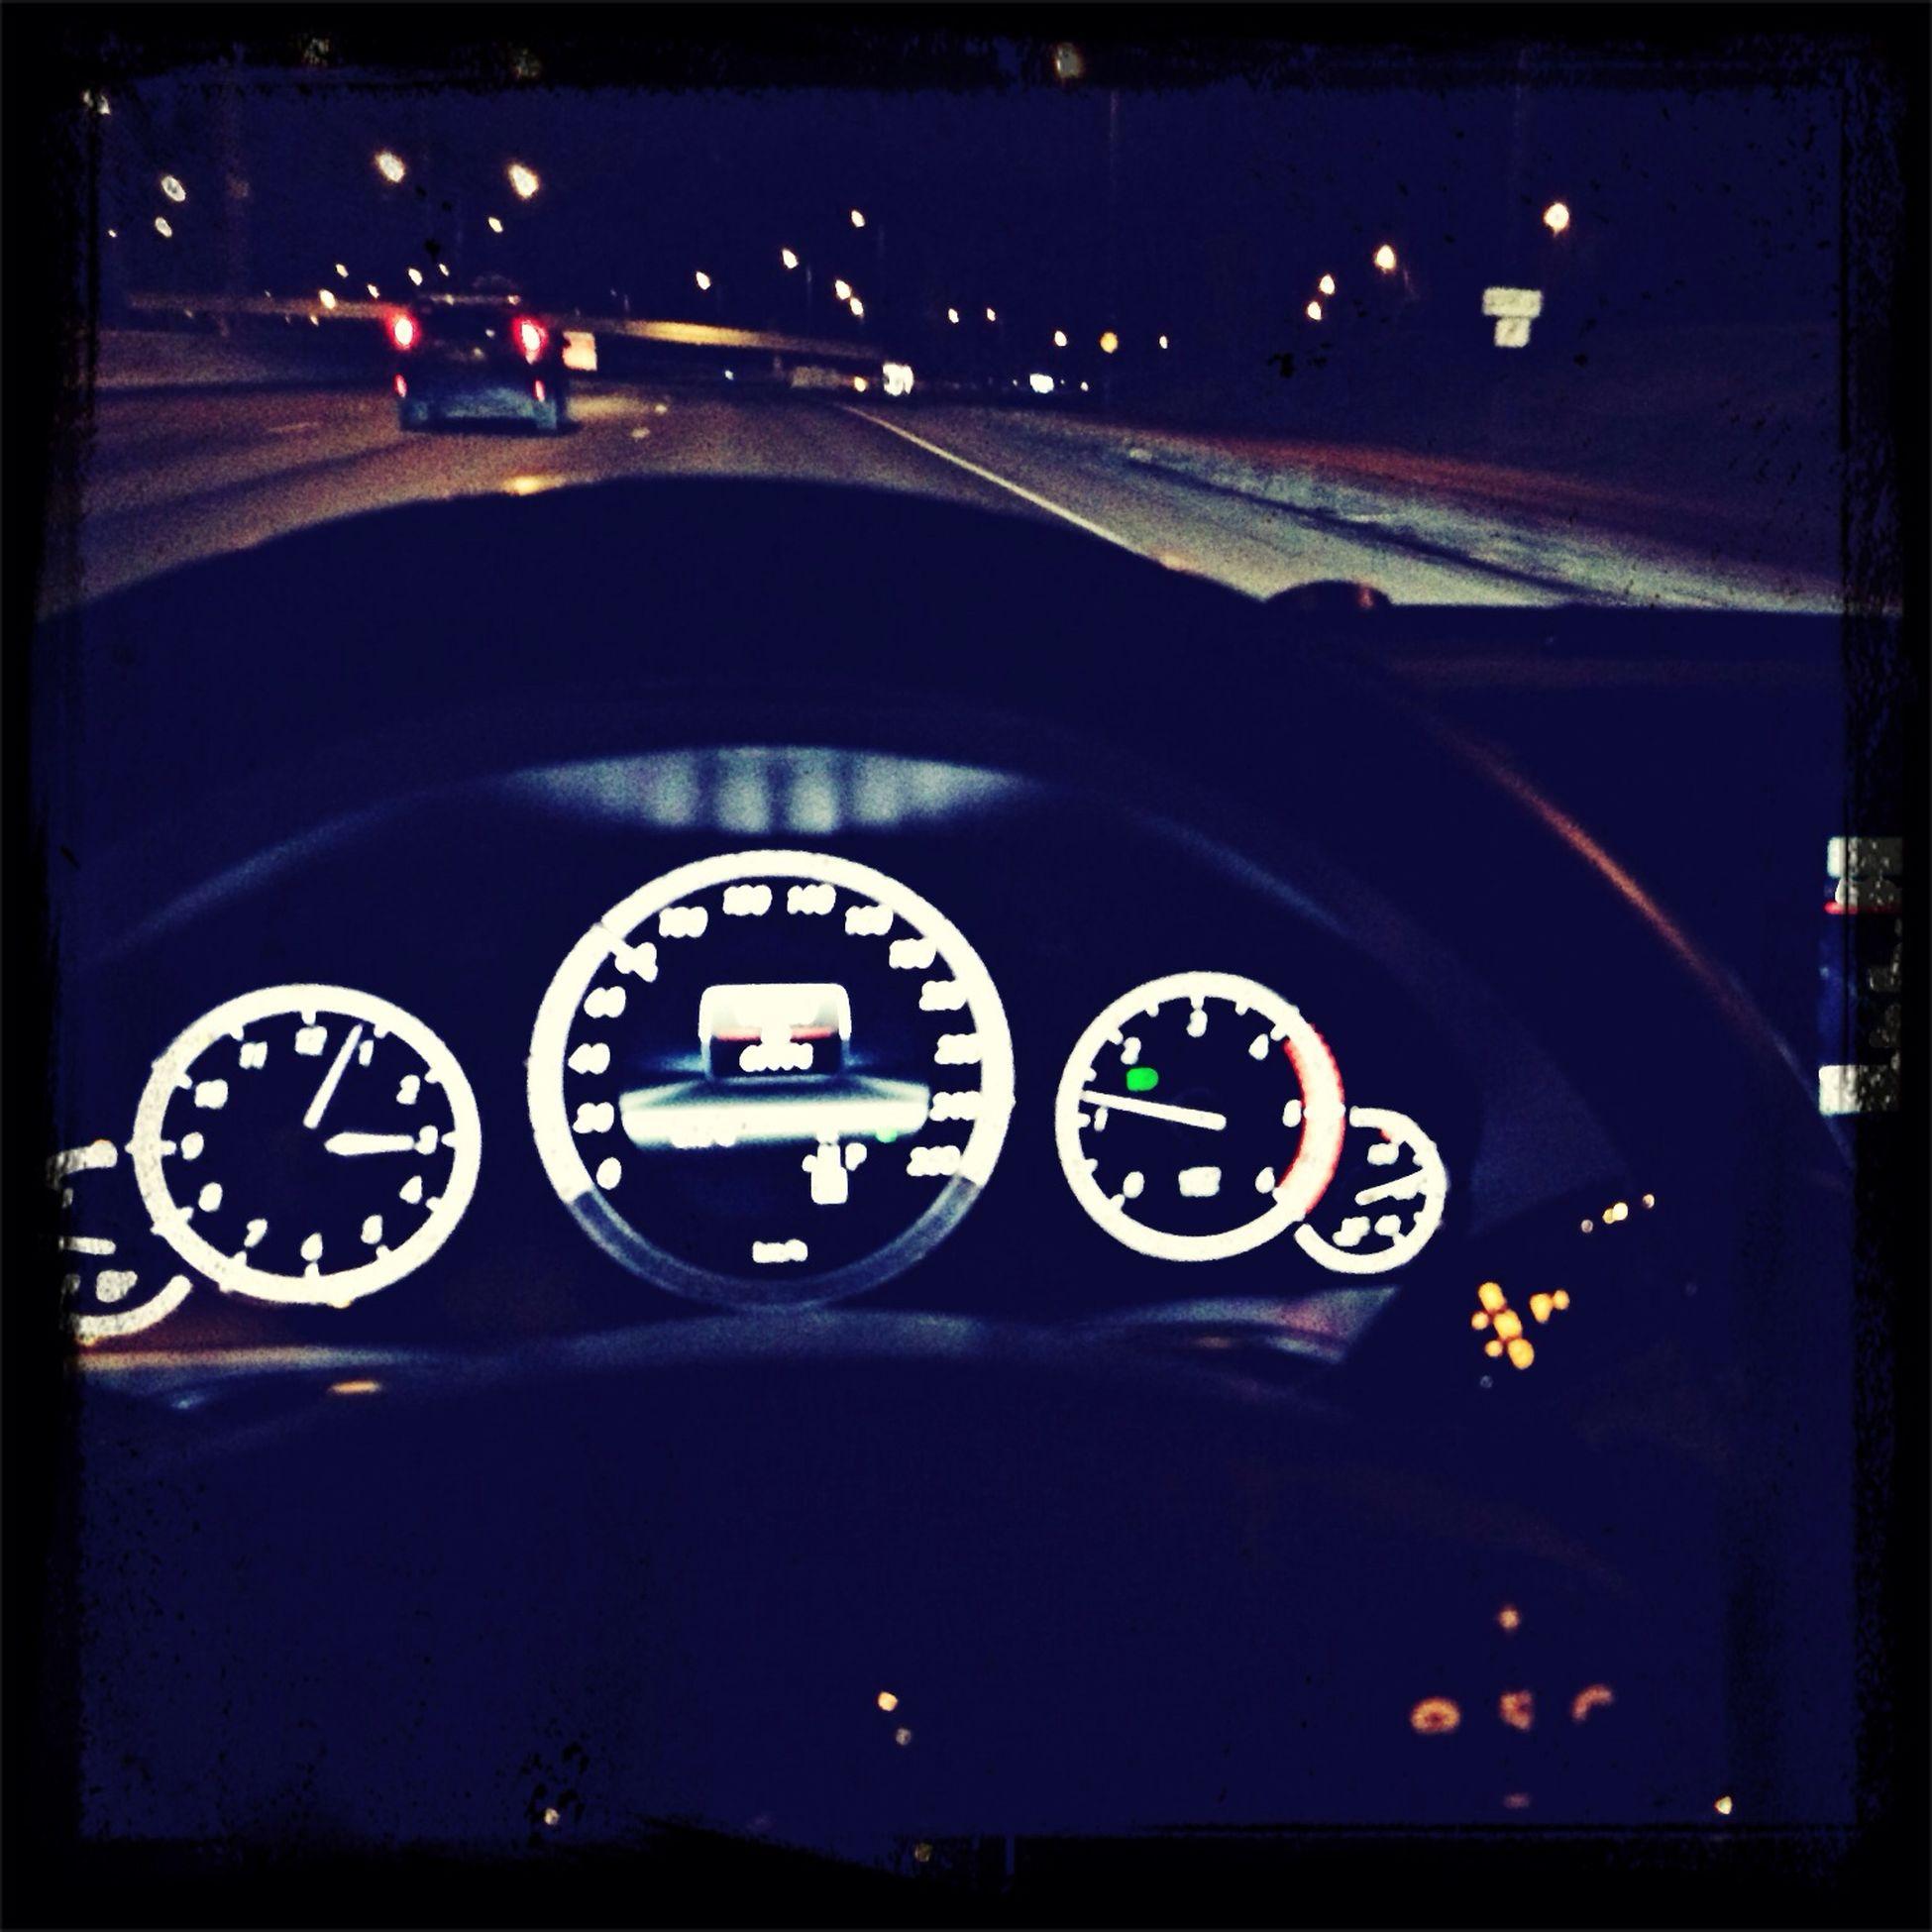 Chillmode SundayCruise Mercedes Benz First Eyeem Photo